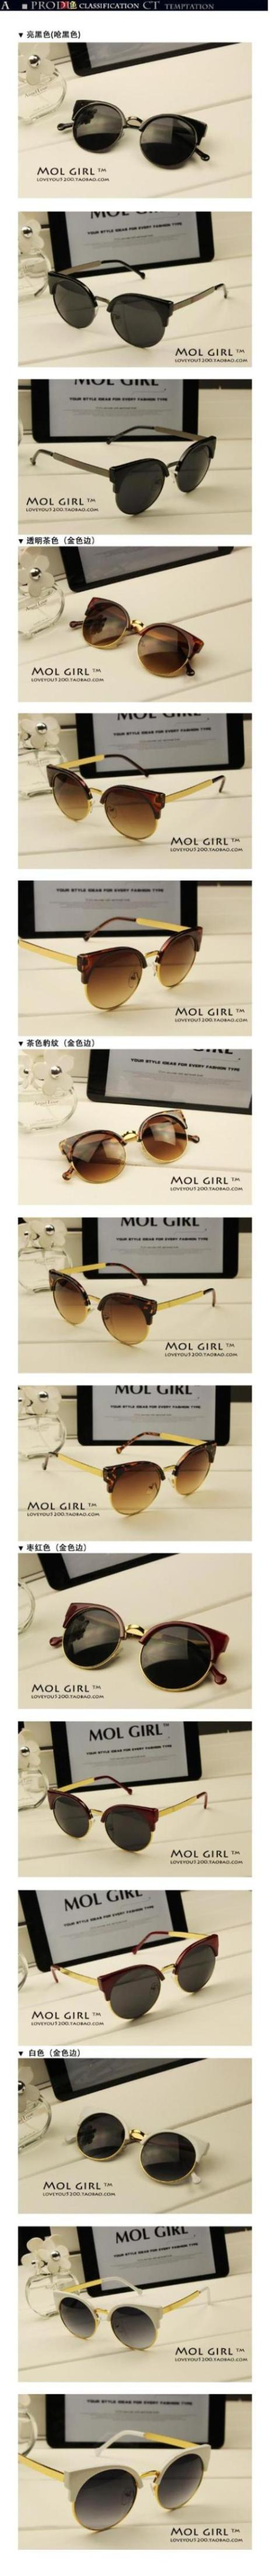 Vintage Retro Cat Eye Round Sunglasses Fashion Stylish 2014 New